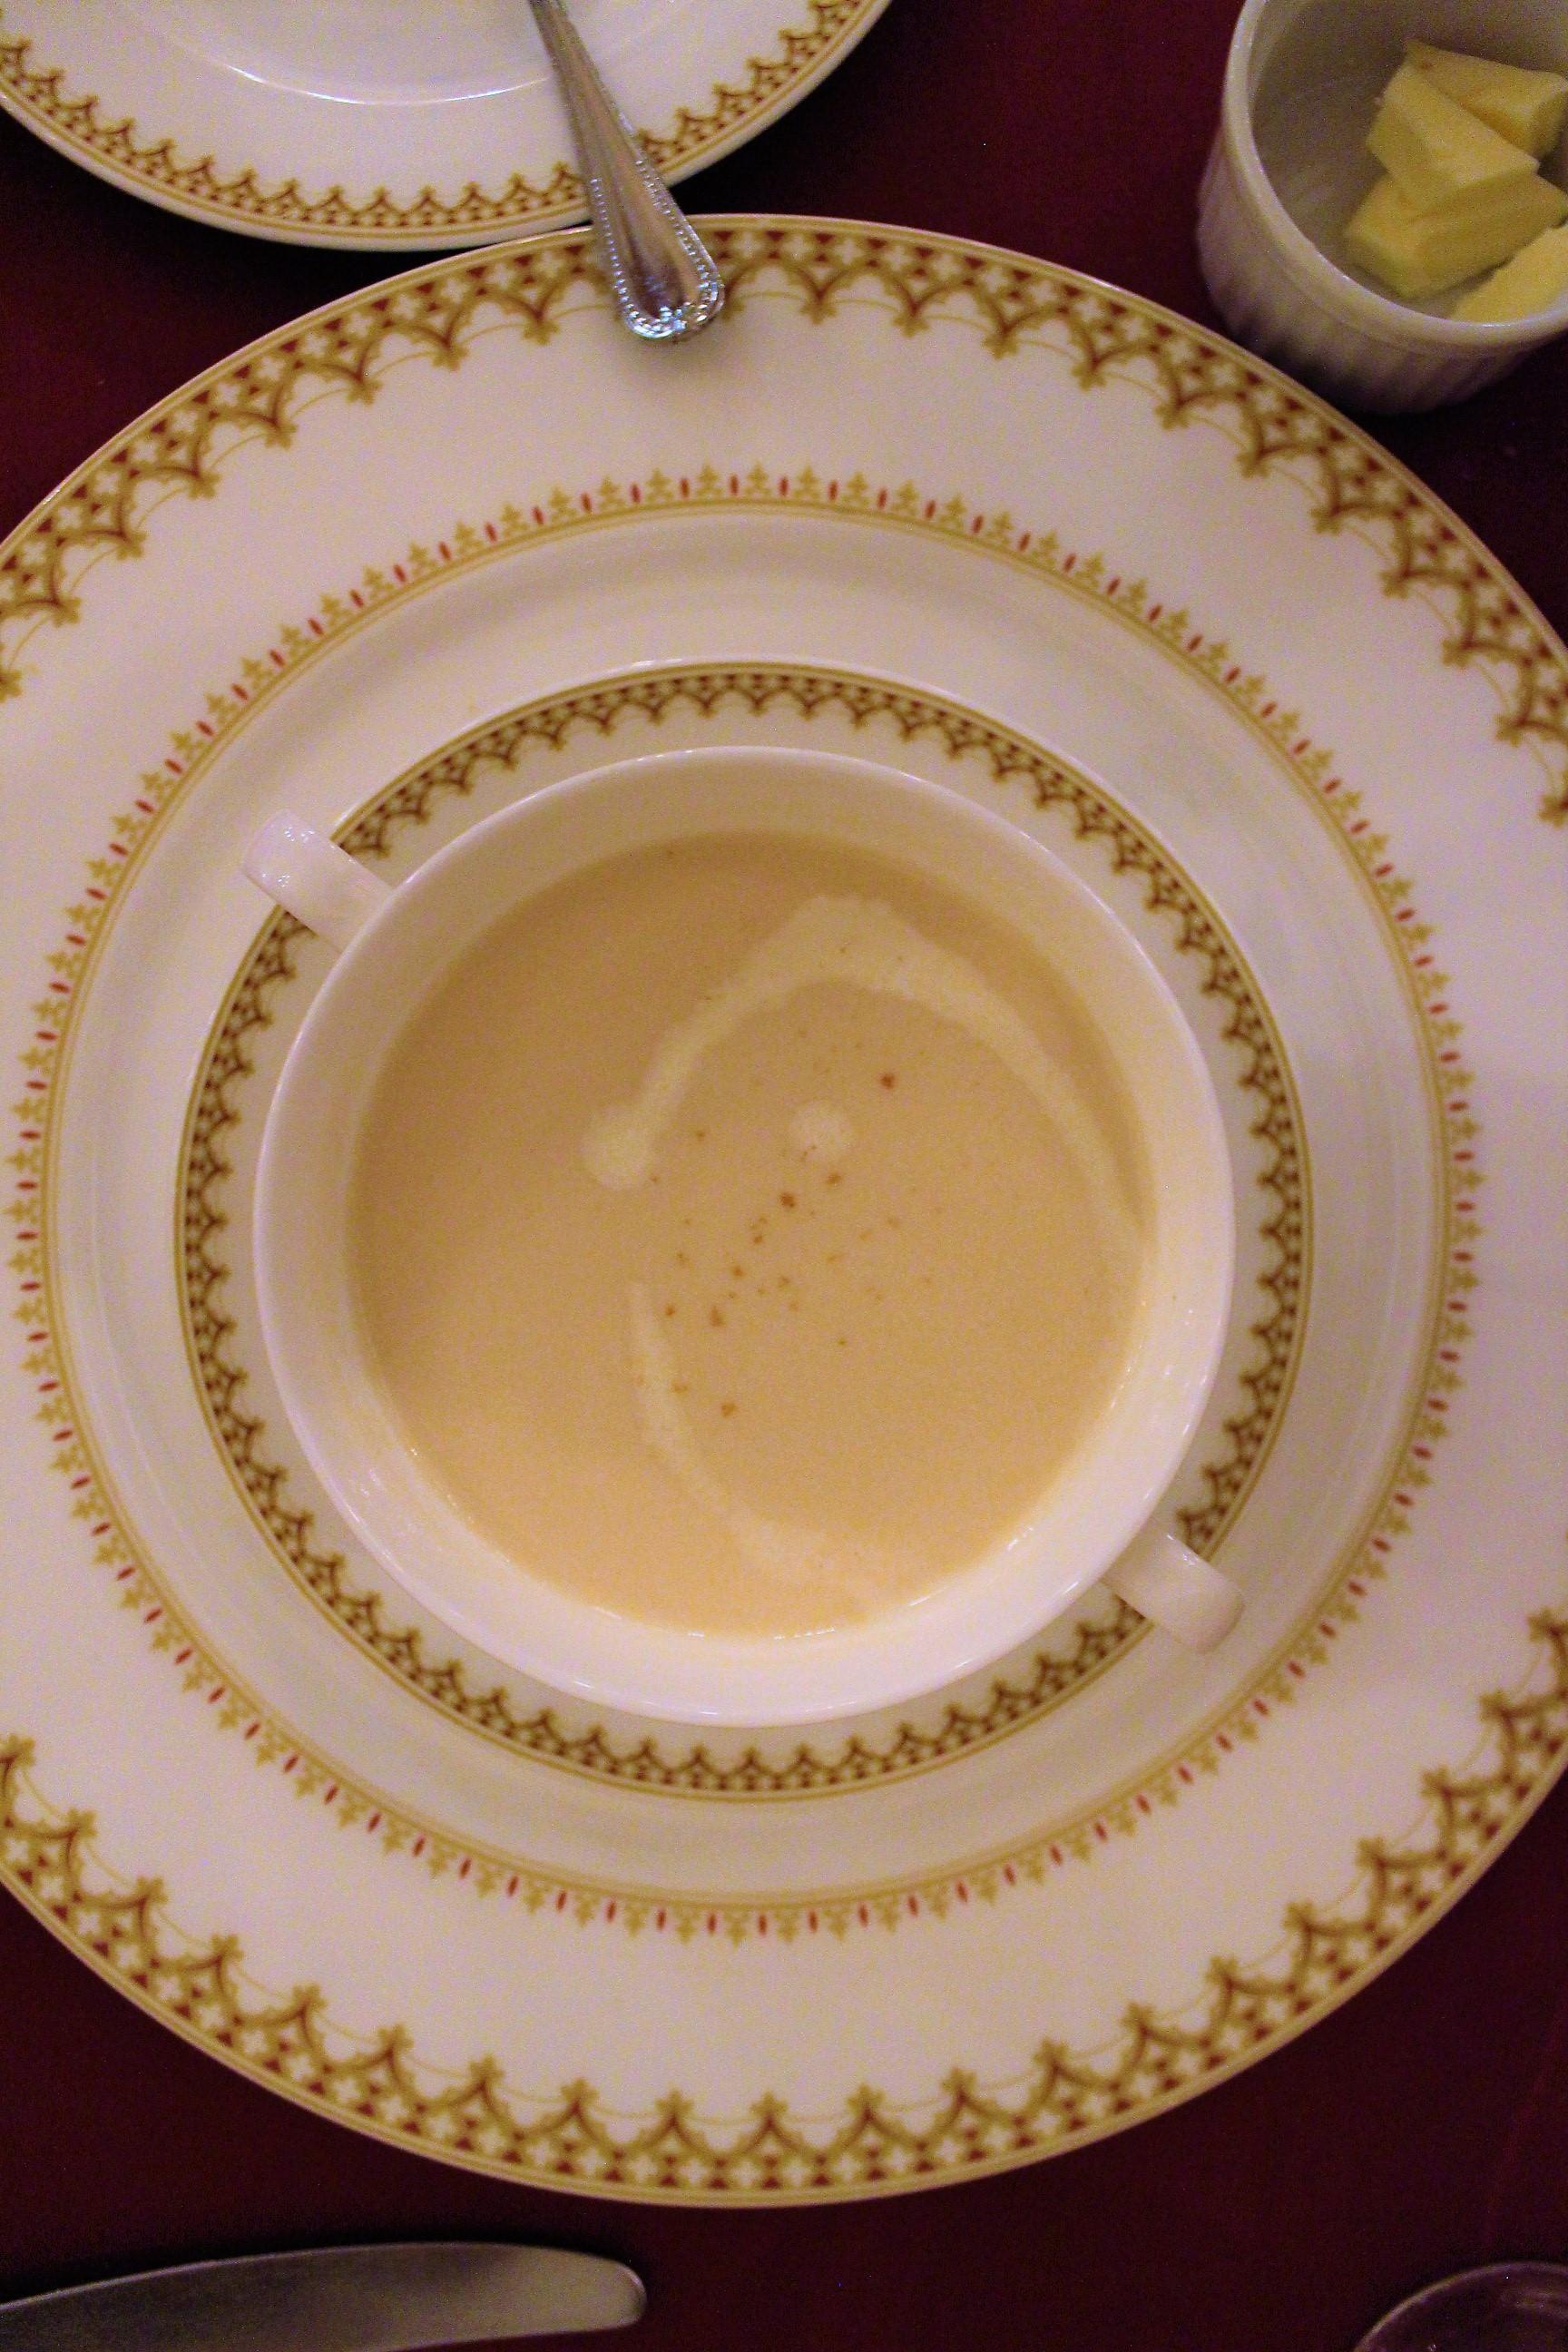 Radish Cream Soup at Magellan's in DisneySea, Tokyo, Japan